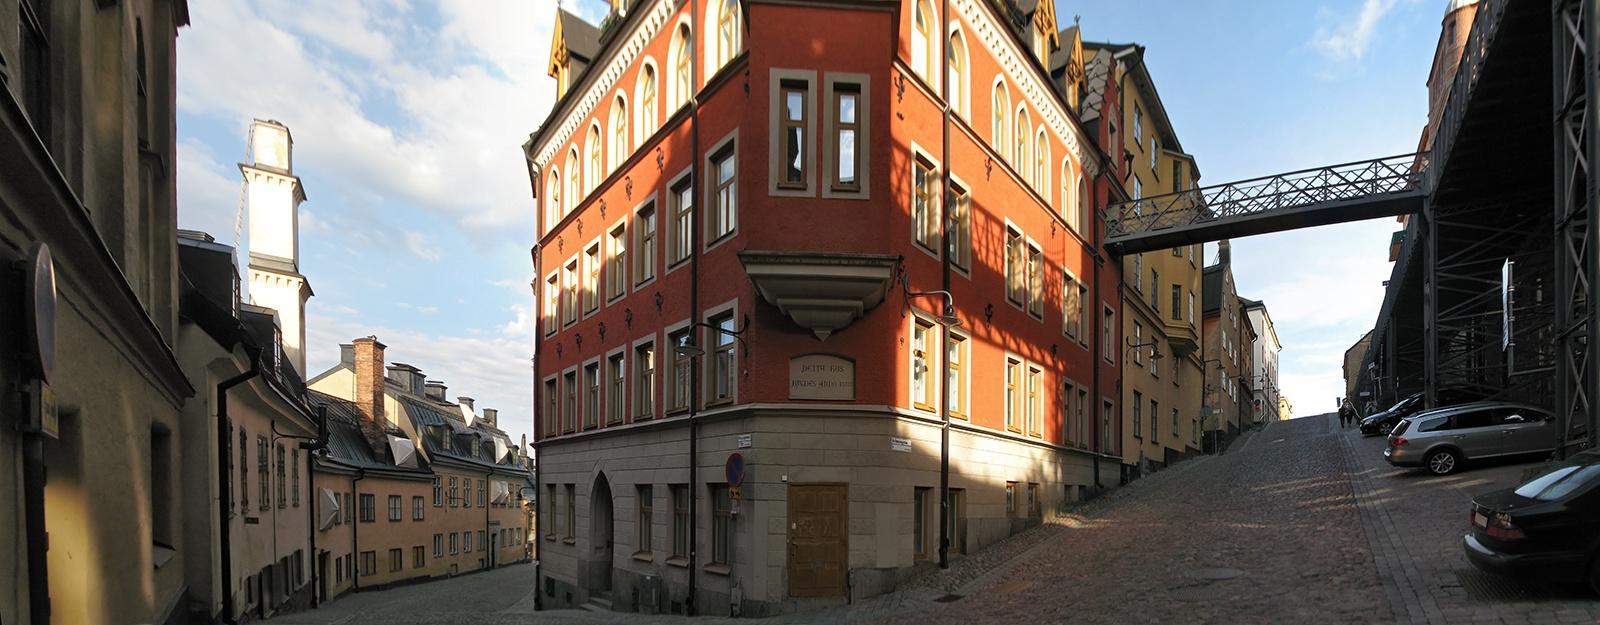 http://dreadnought.narod.ru/Images/2018/Stokholm/17.09.18__20-24sm.jpg